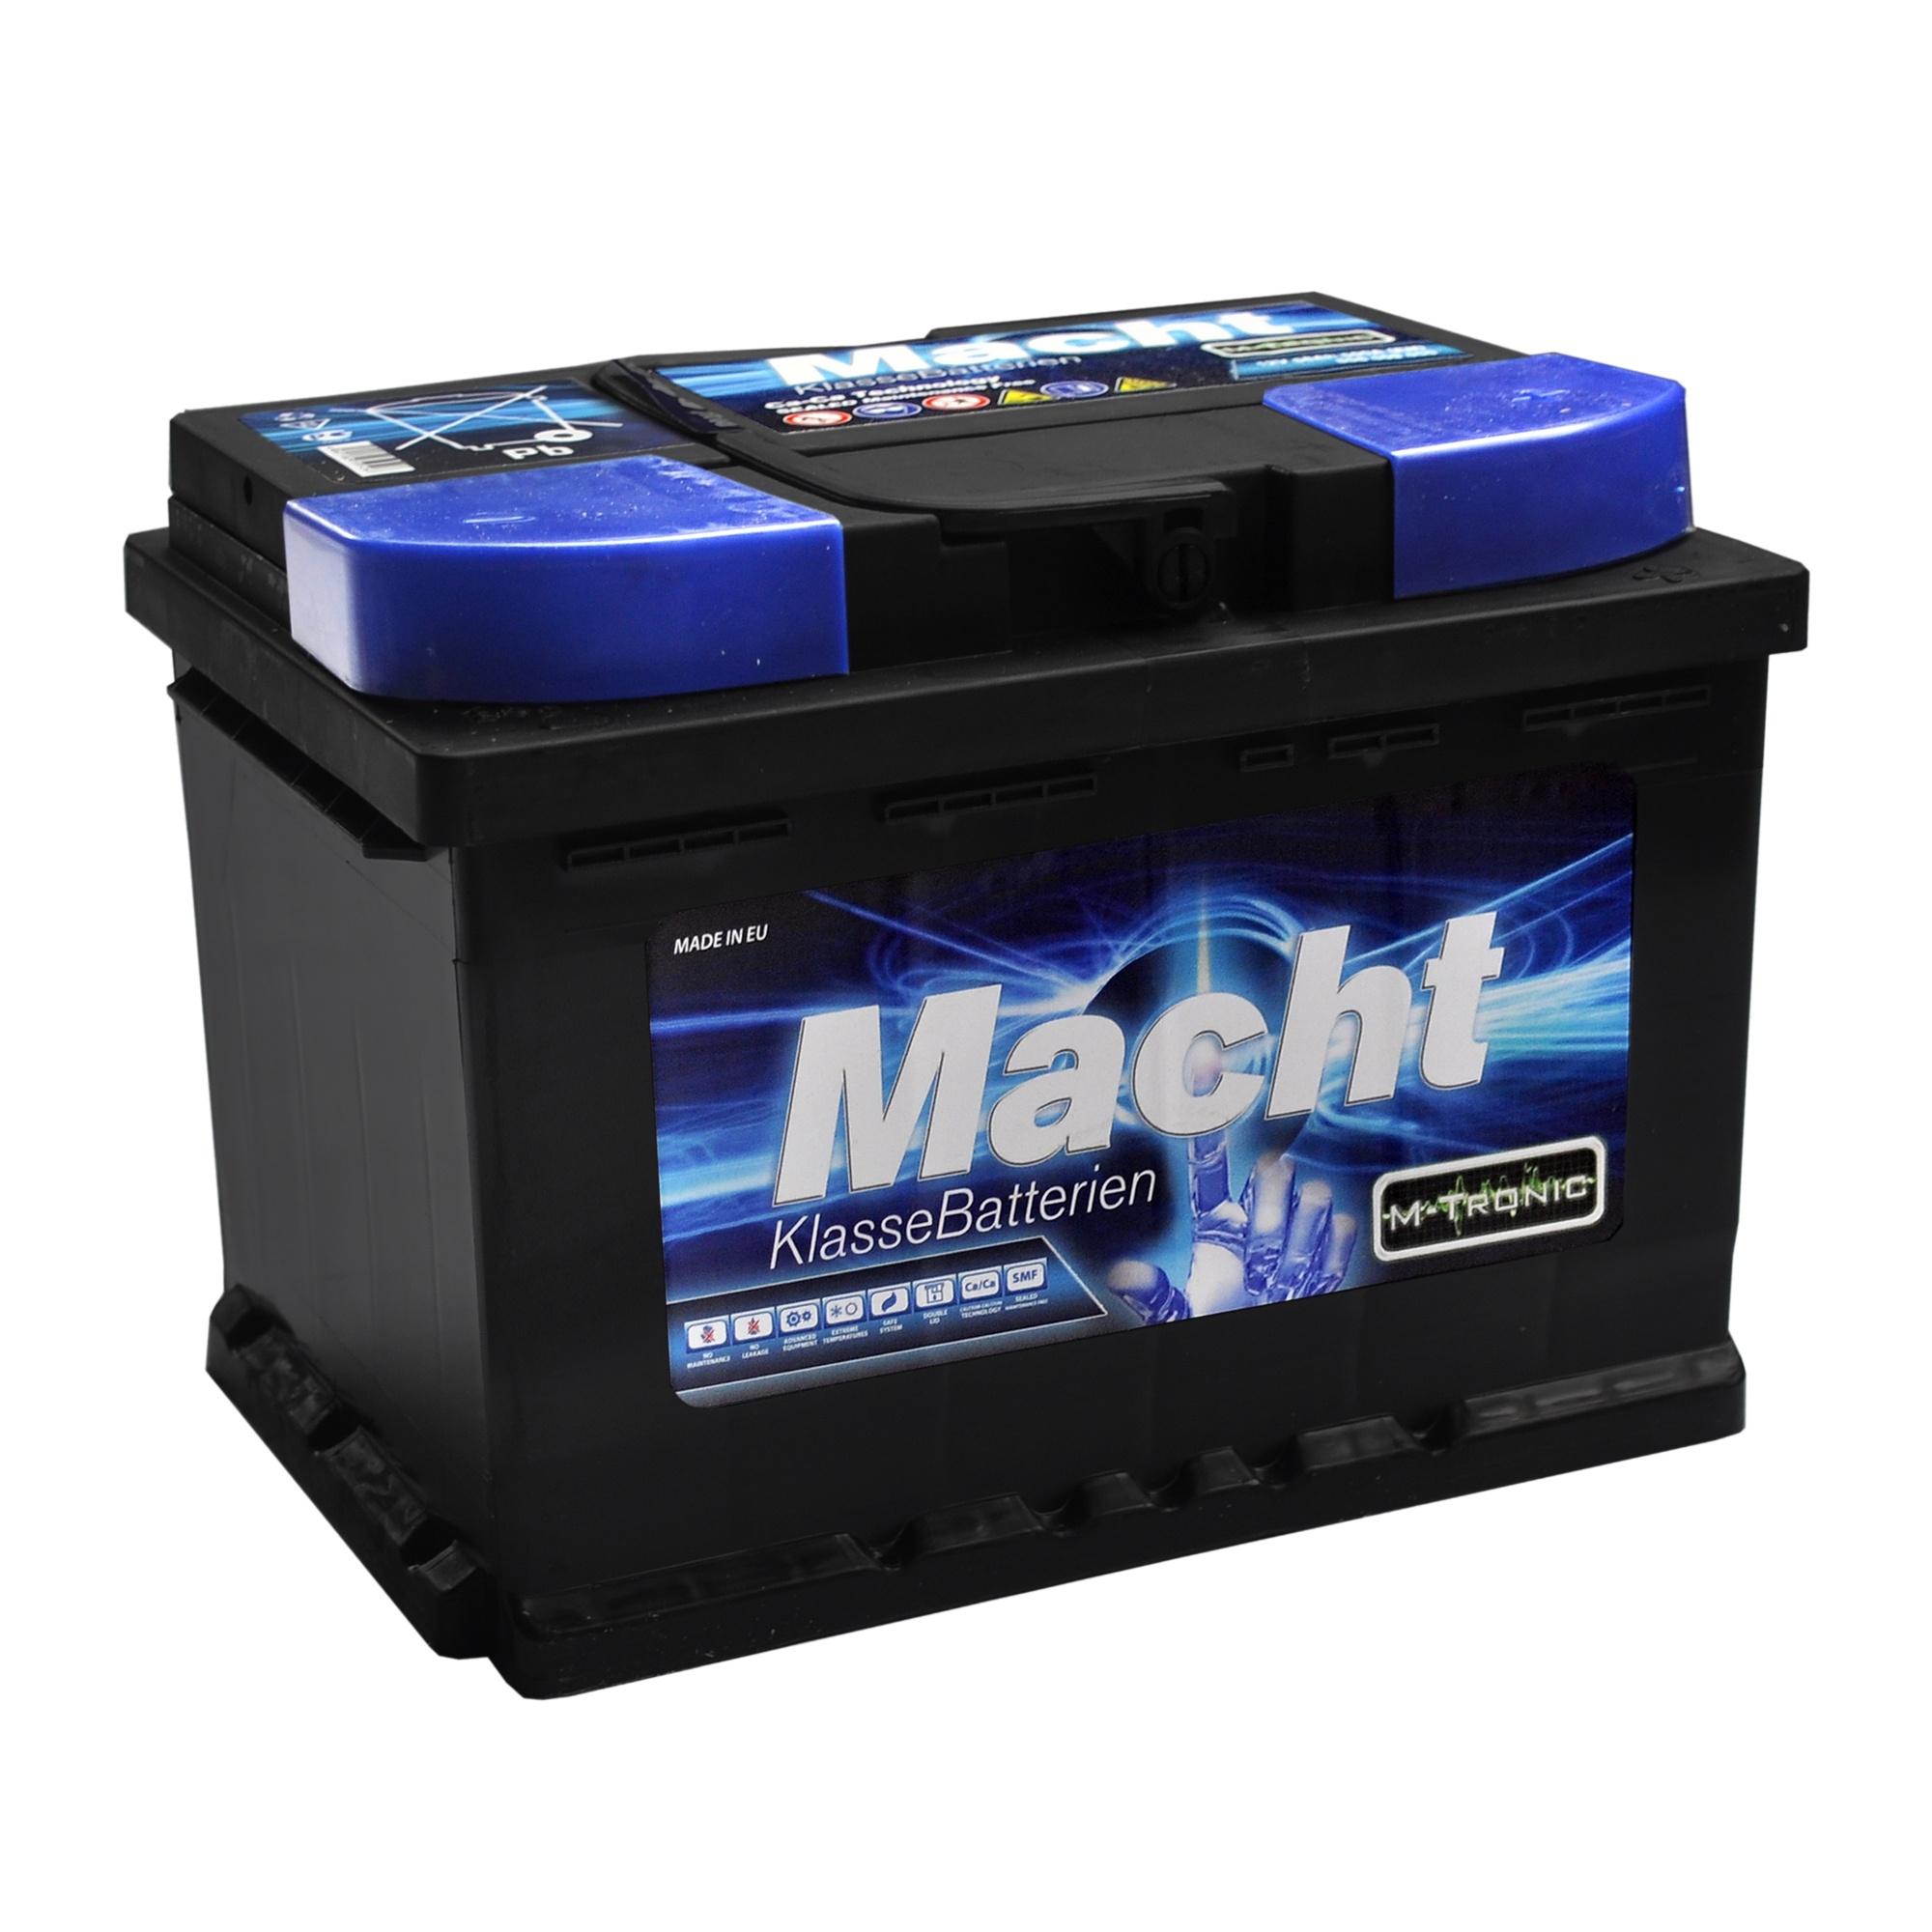 Baterie auto MACHT 25633 M-Tronic 12V 56 Ah 500A - 3 ANI GARANTIE